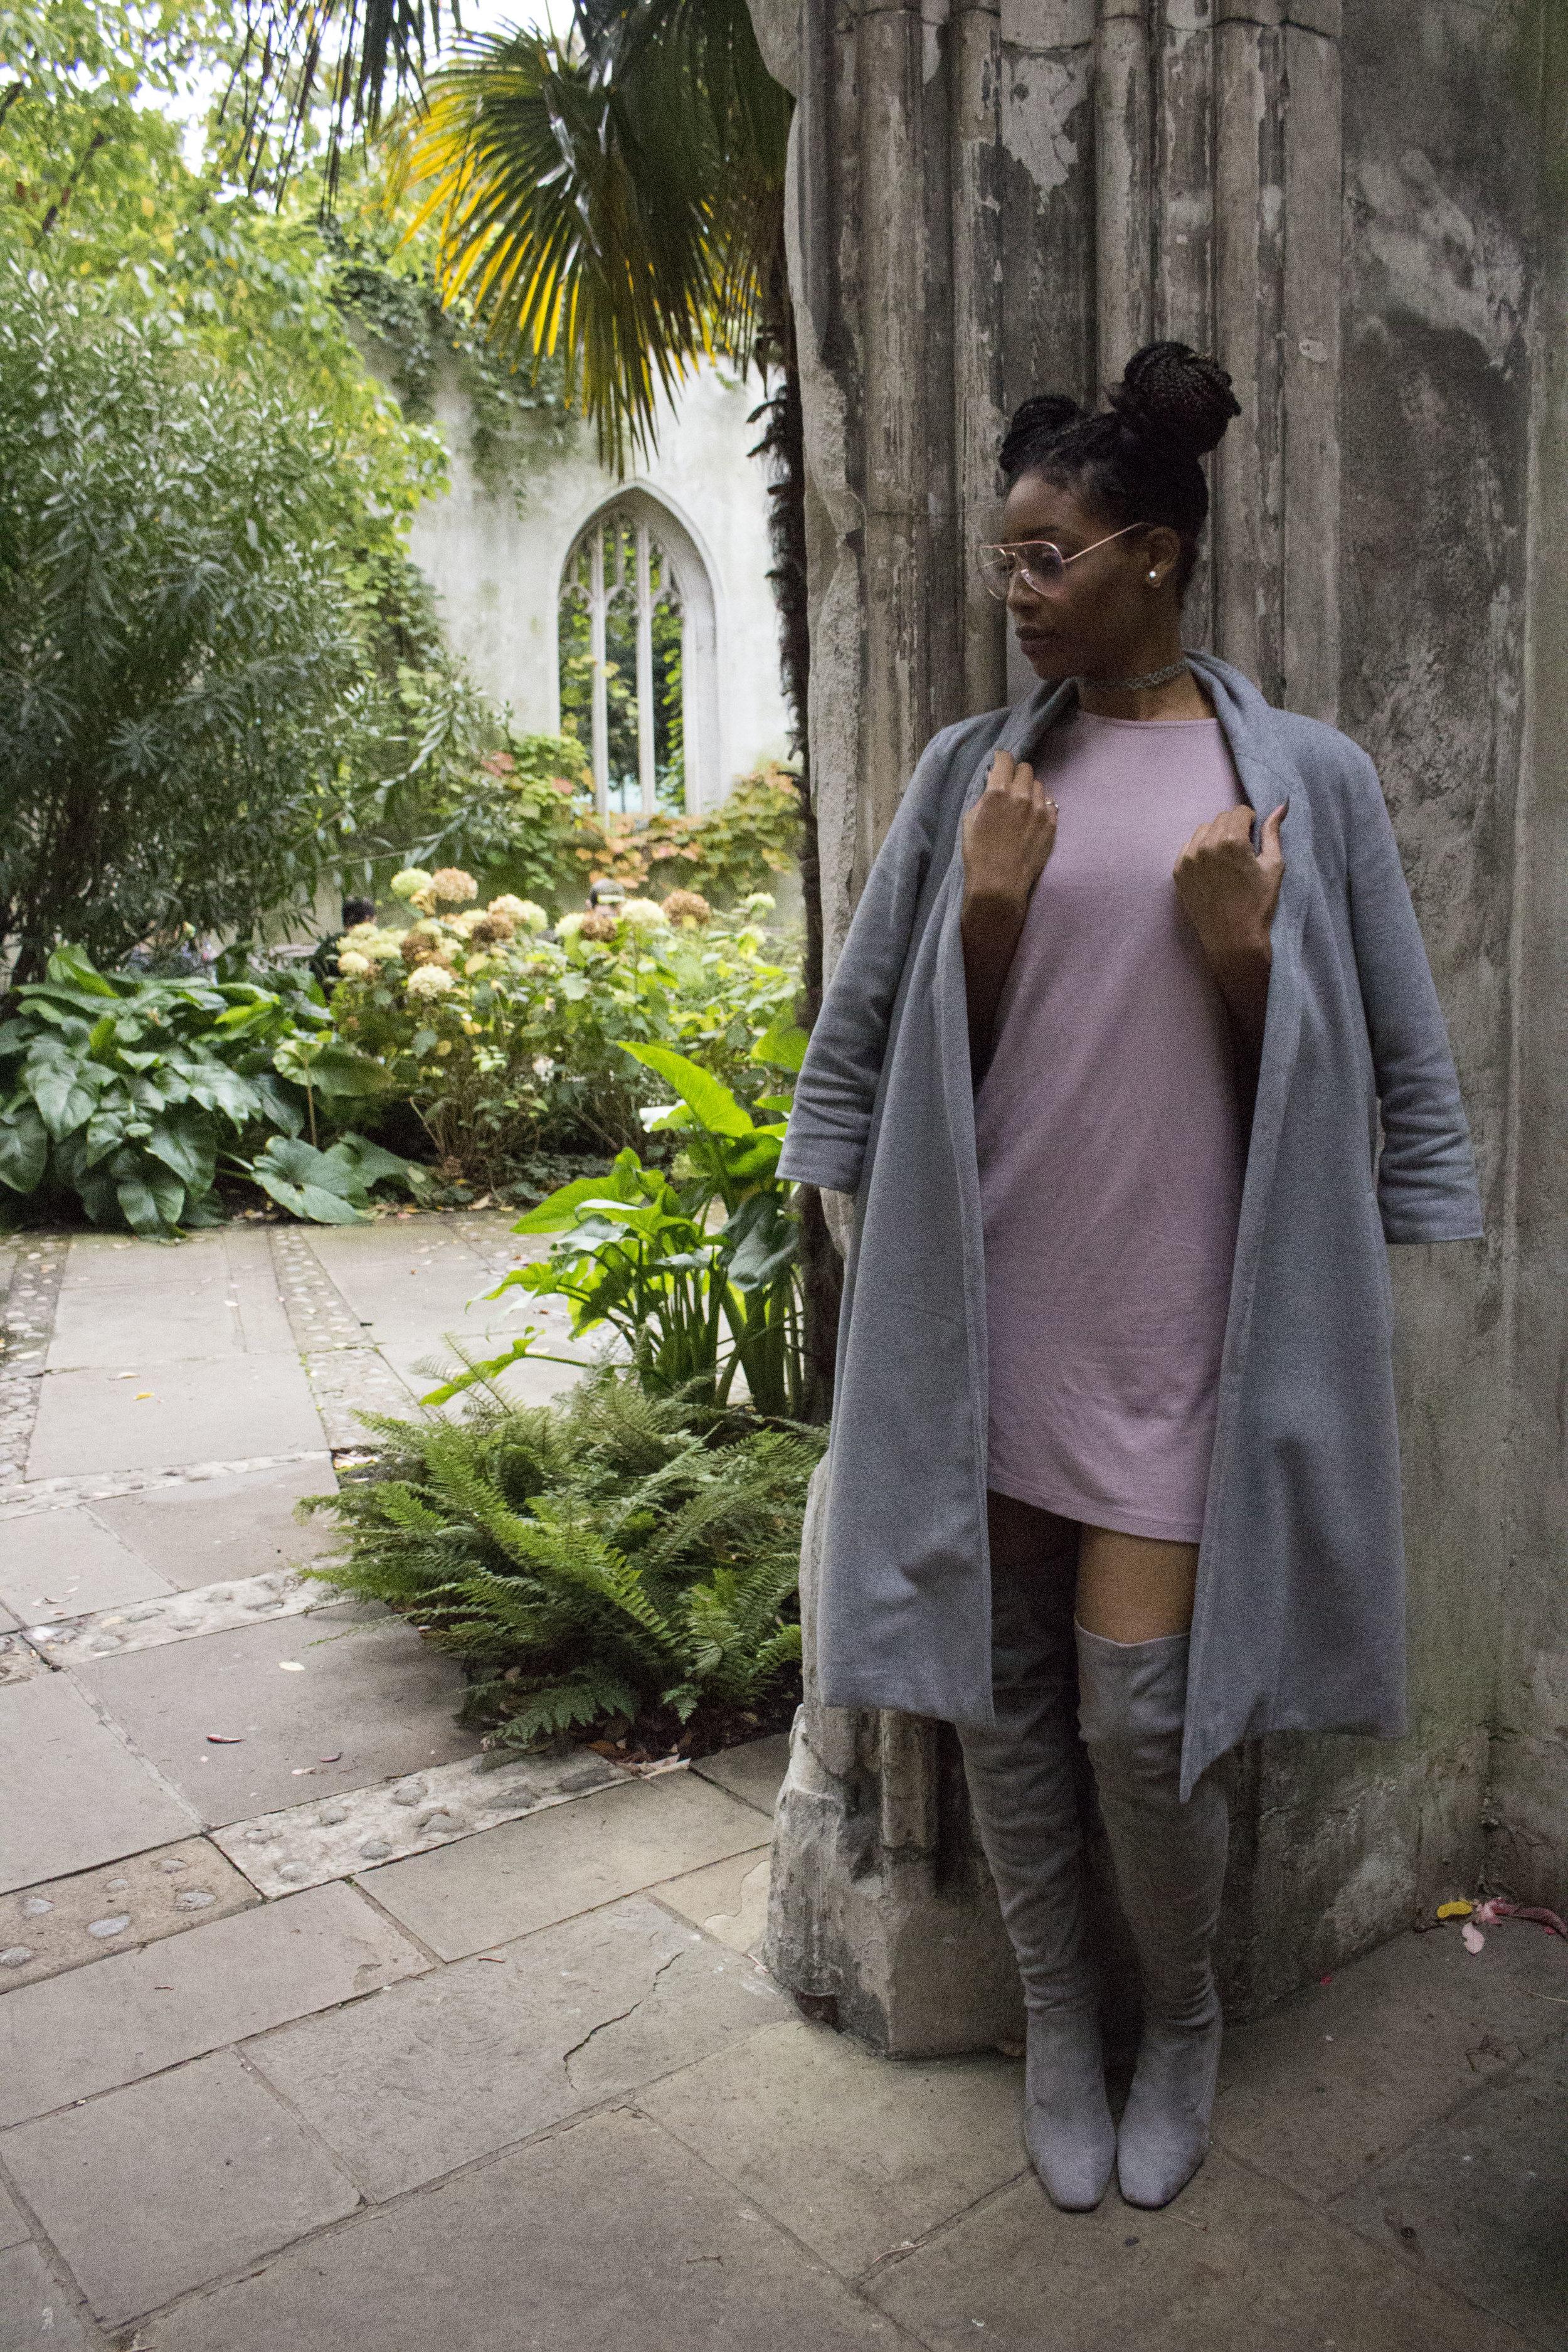 Rose gold glasses - Fashion Prescription    Grey choker - Wish    Grey duster coat - Amazon    Mauve dress and grey thigh high boots - ASOS